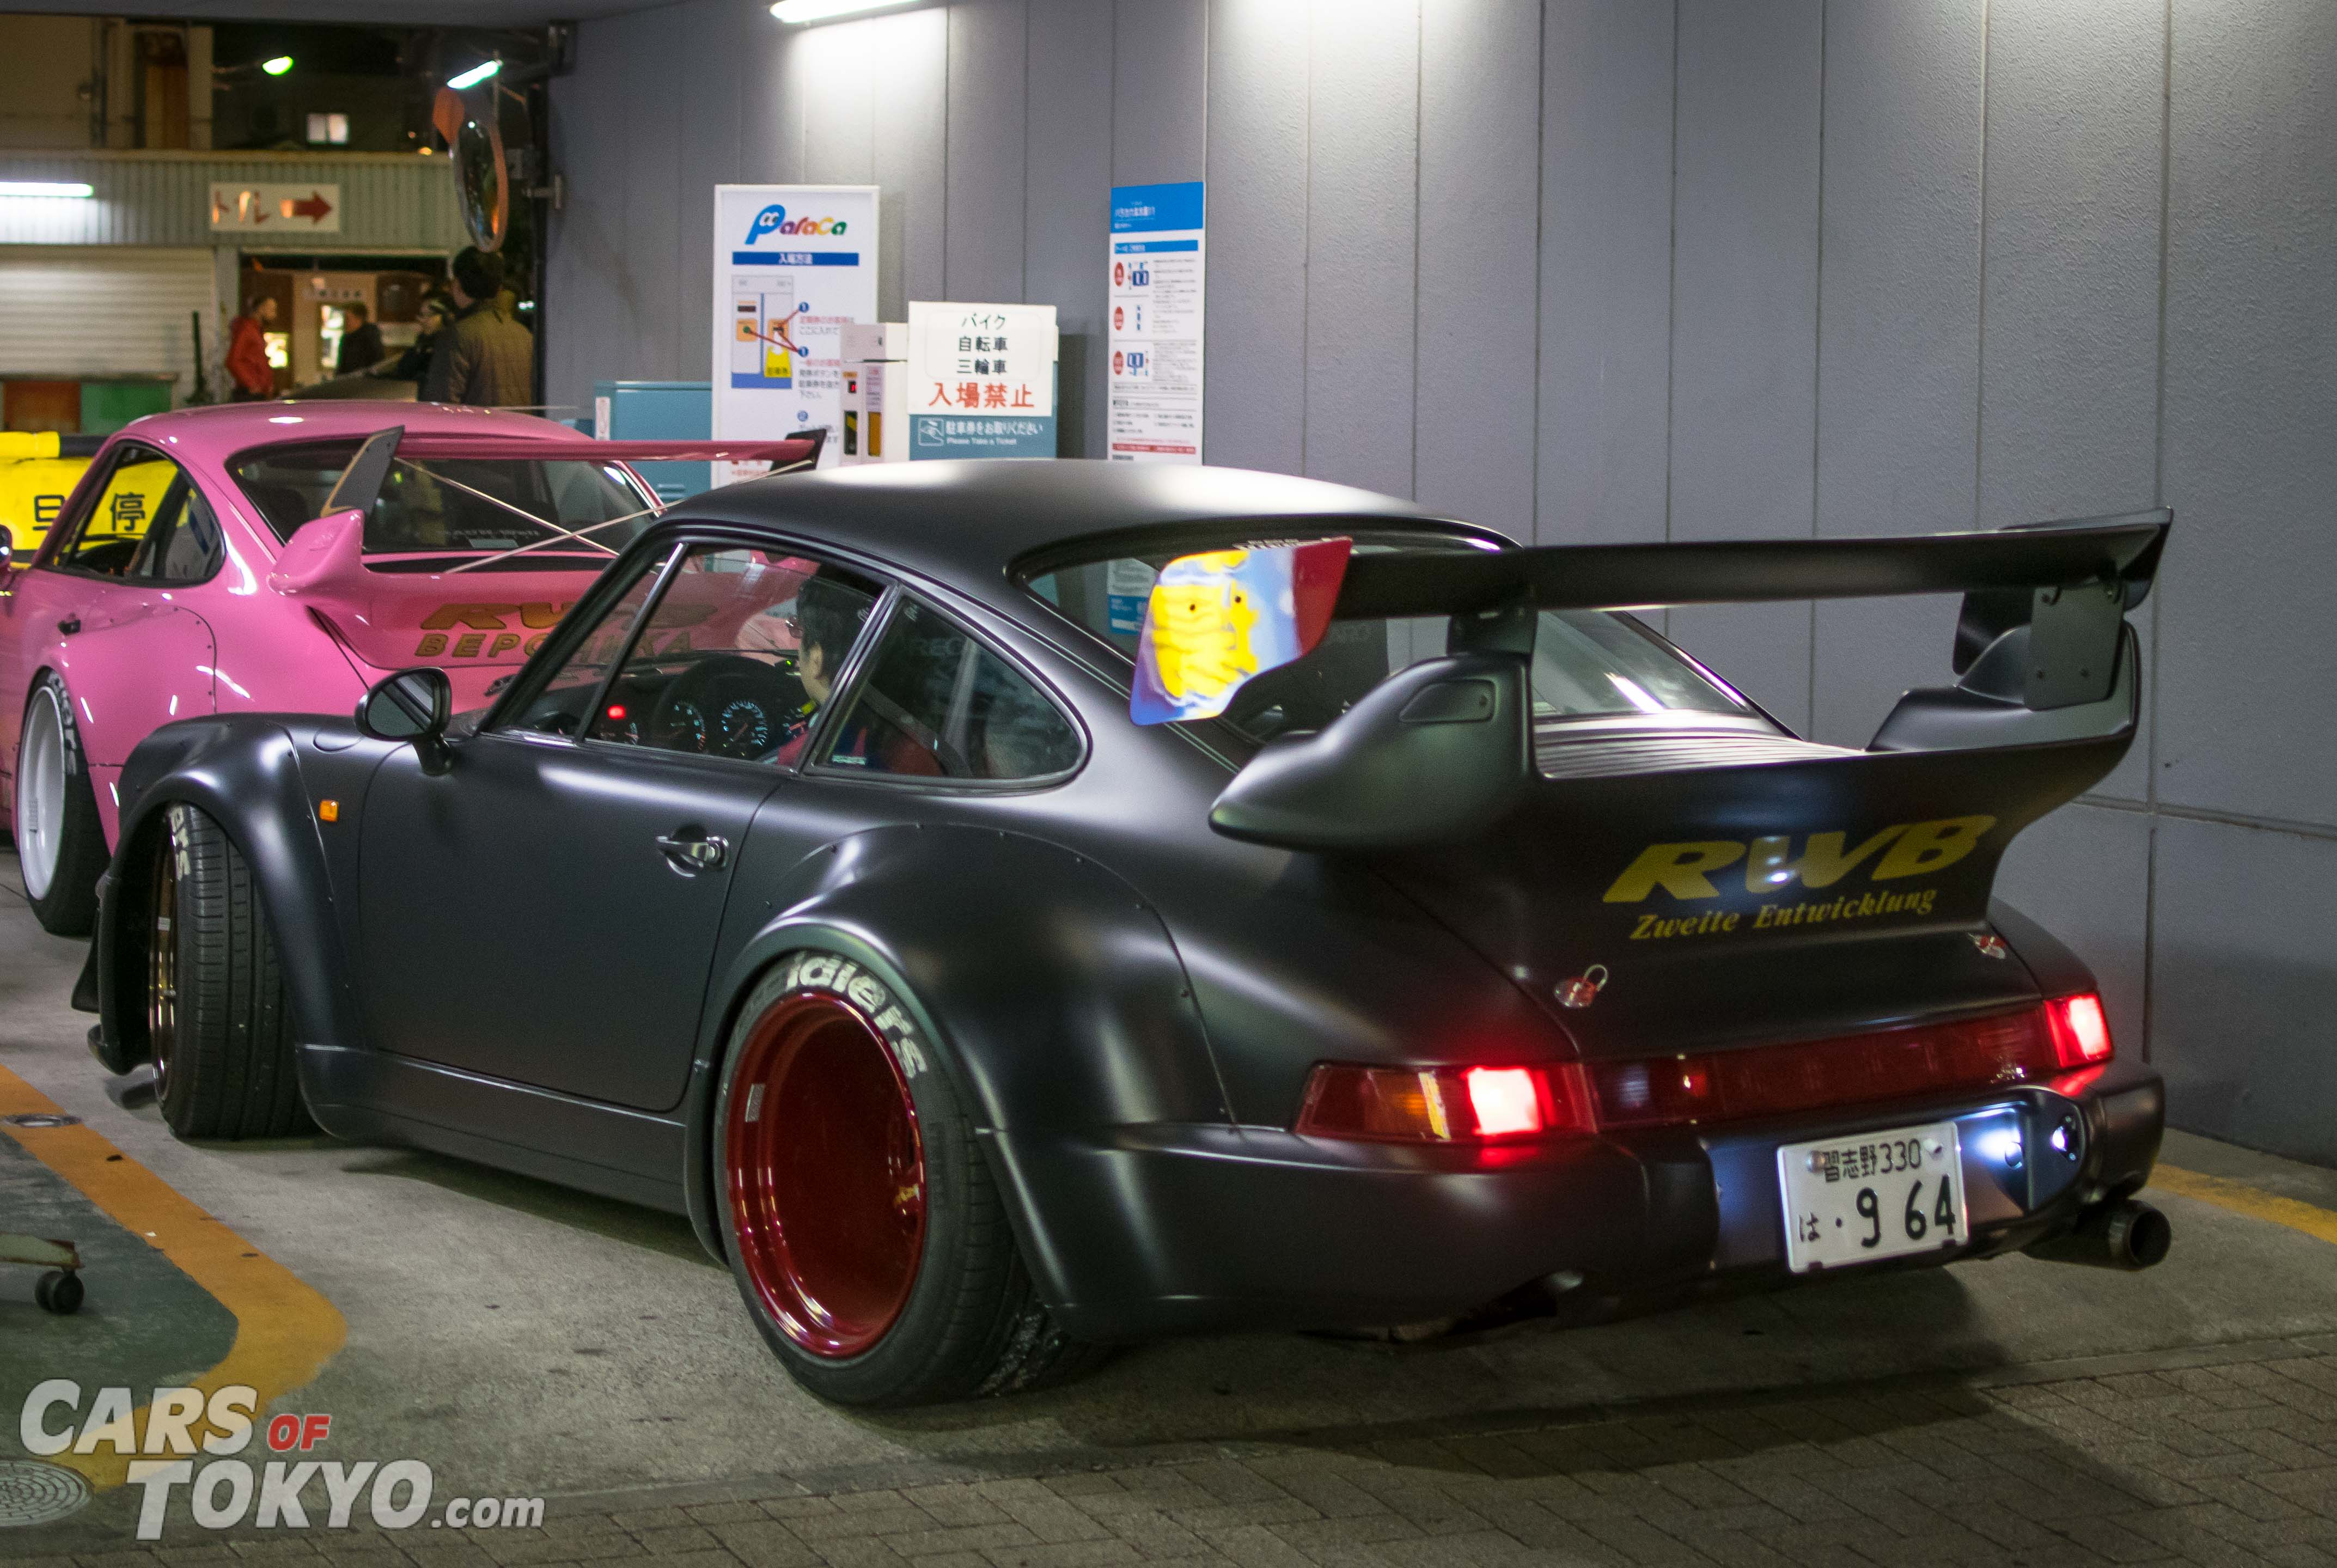 Cars of Tokyo RWB Porsche 911 964 Black & Pink